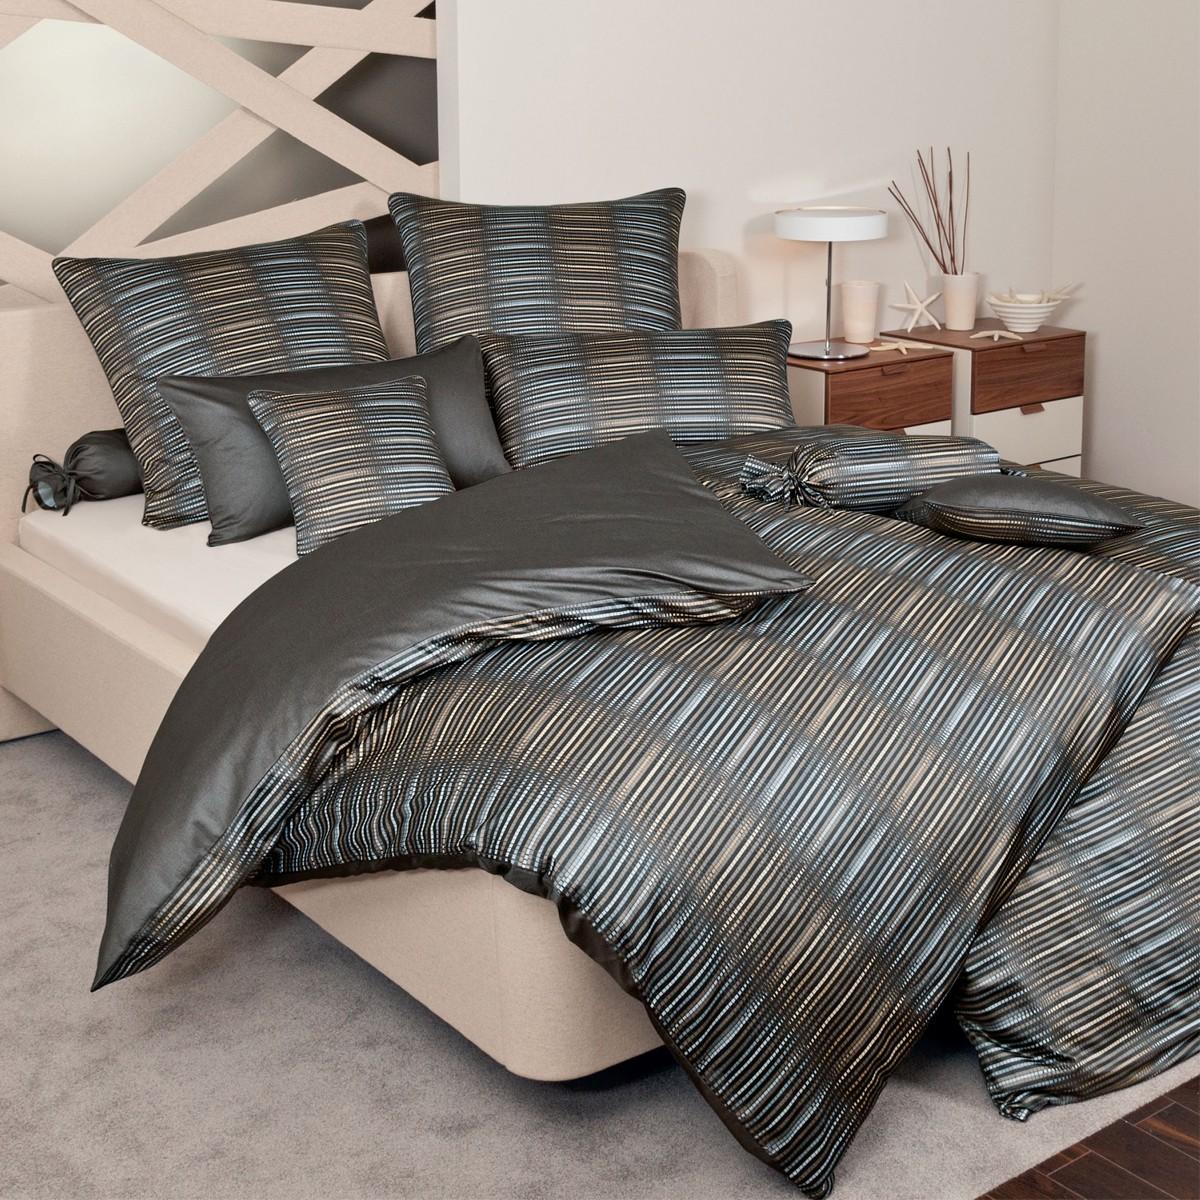 janine interlock feinjersey bettw sche carmen 5457 07. Black Bedroom Furniture Sets. Home Design Ideas